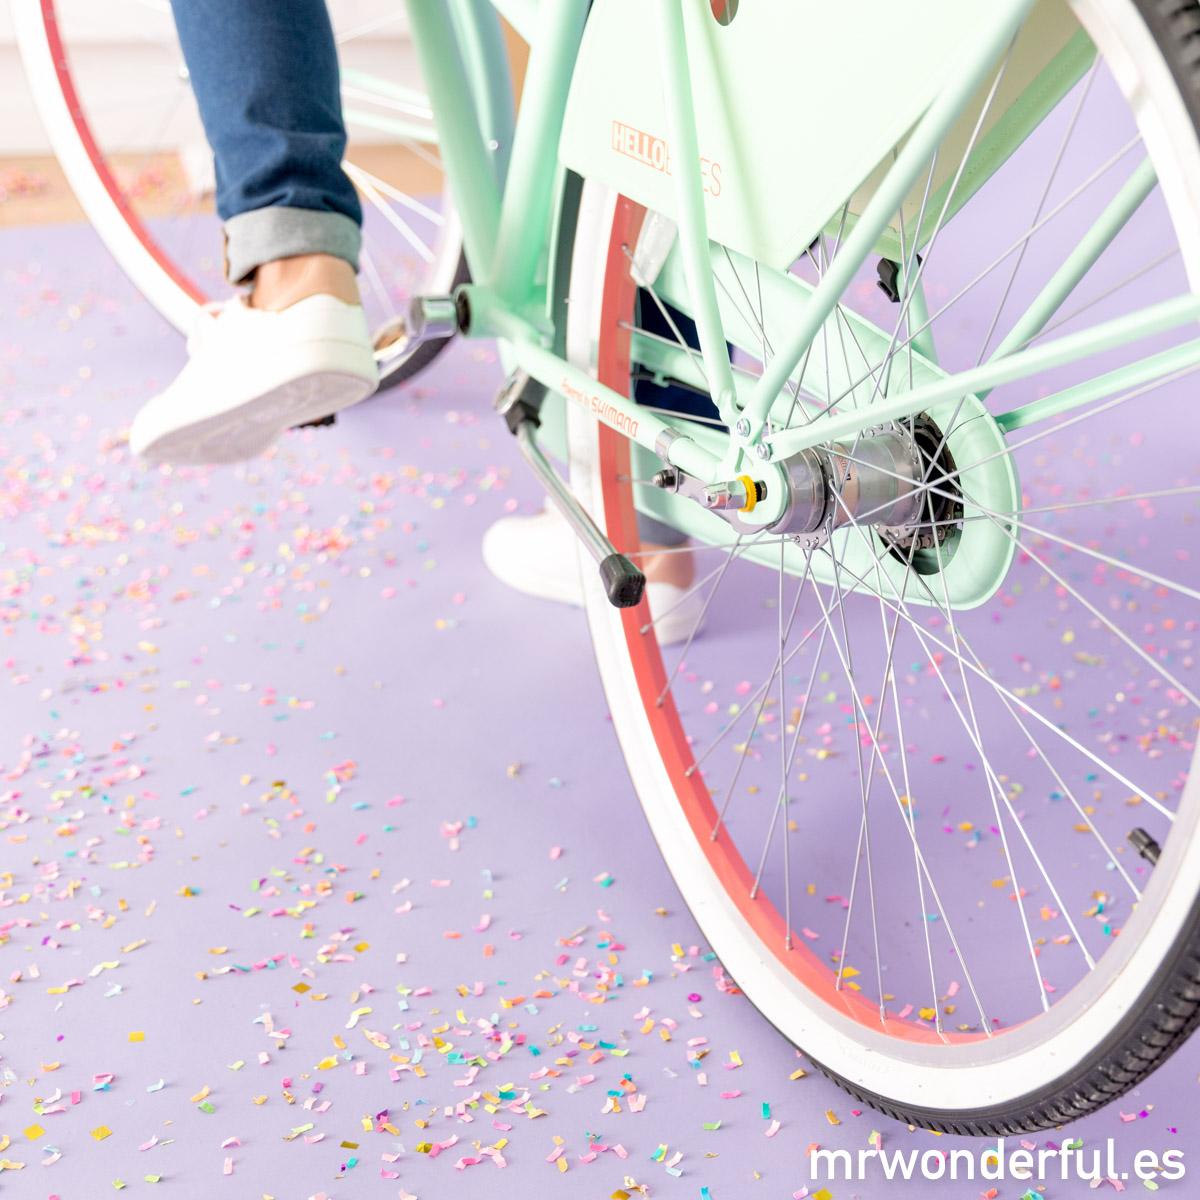 mrwonderful_bici-amsterdam-sorteo-2016-248